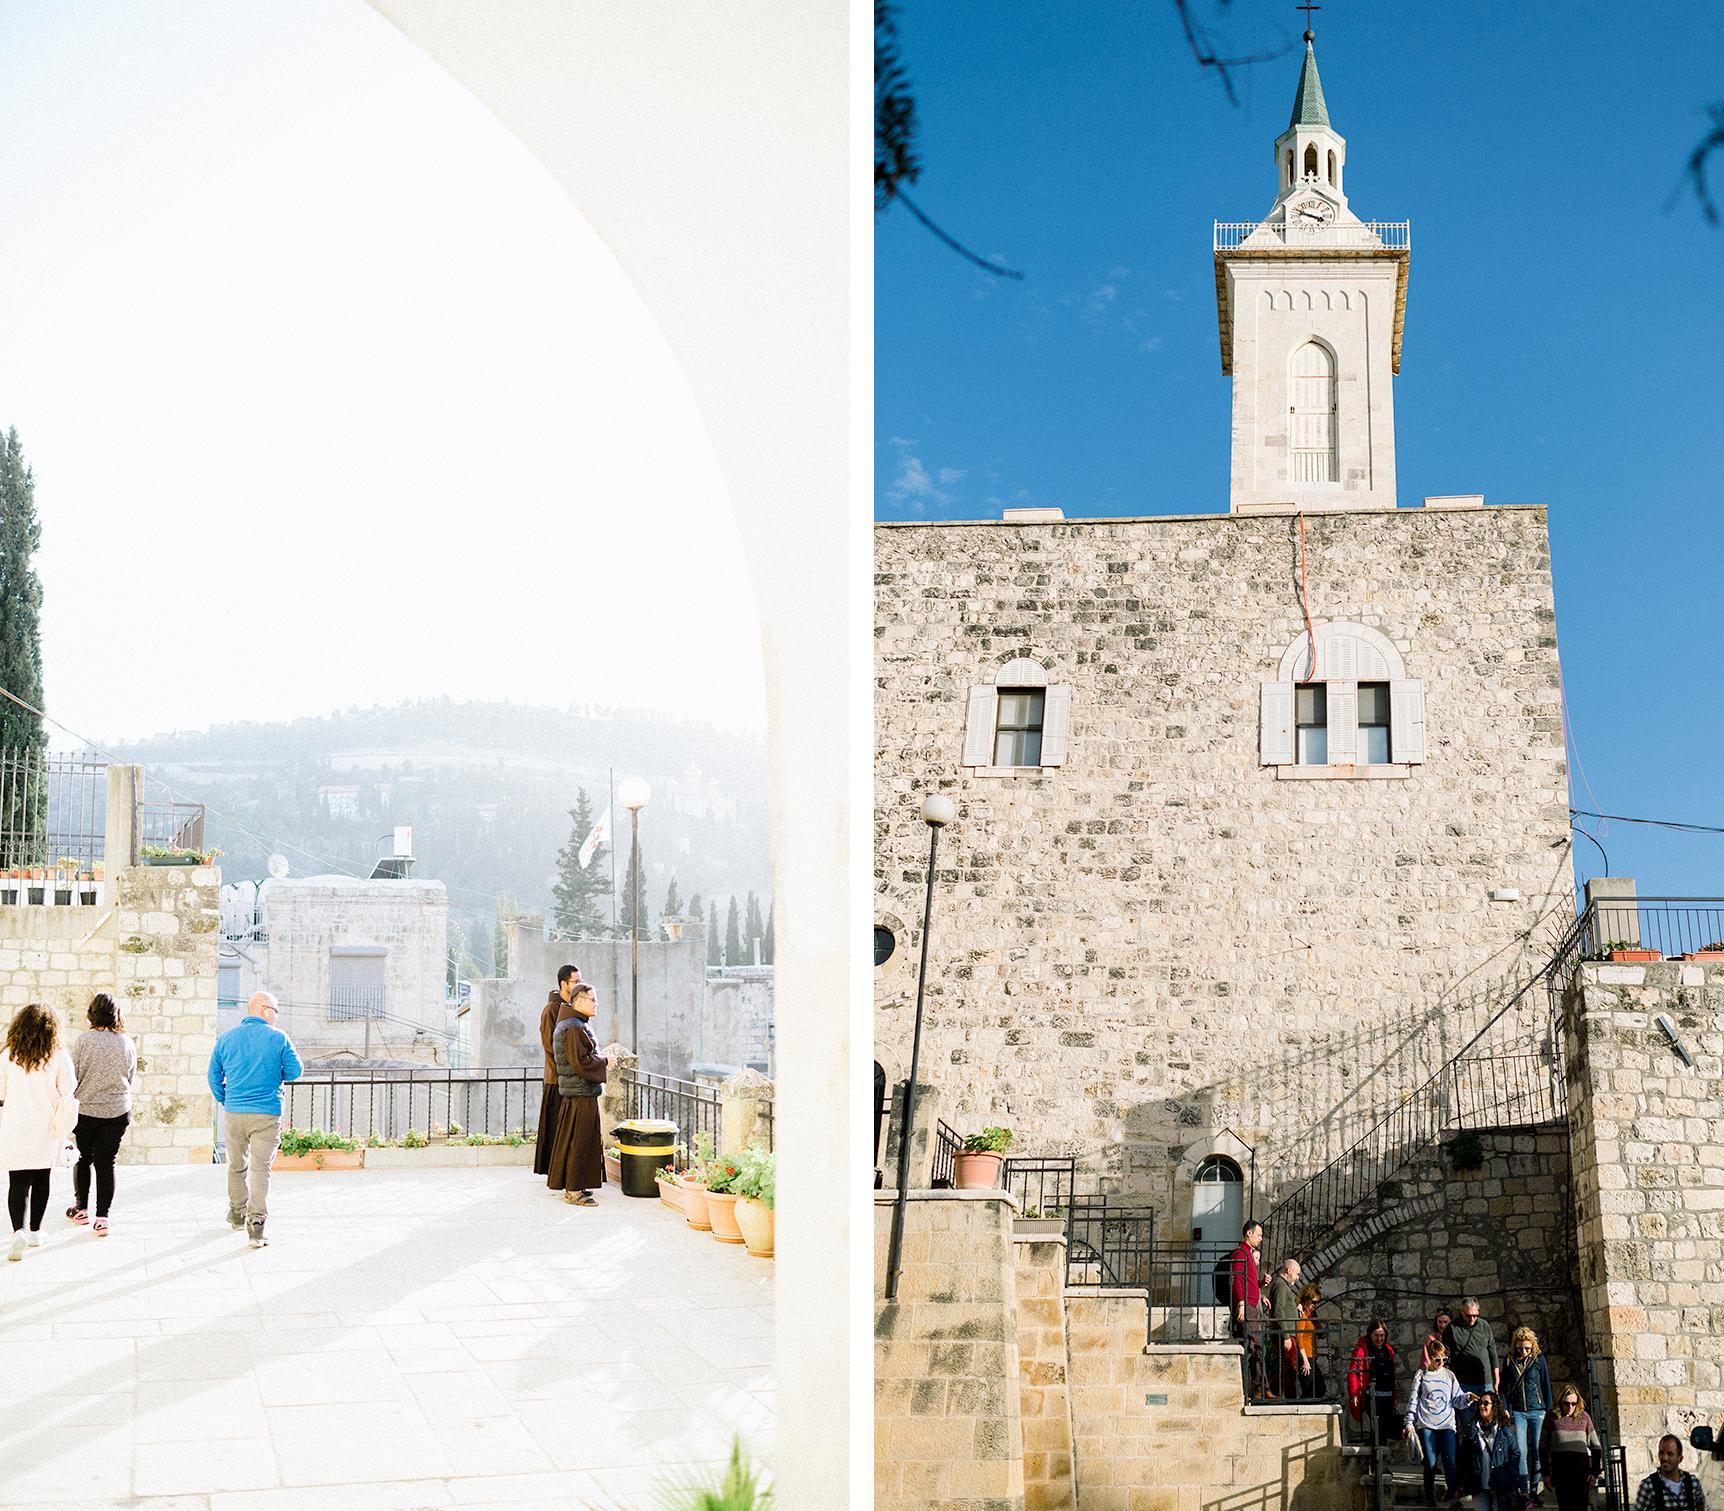 20190126_BYU-JERUSALEM_x009.jpg